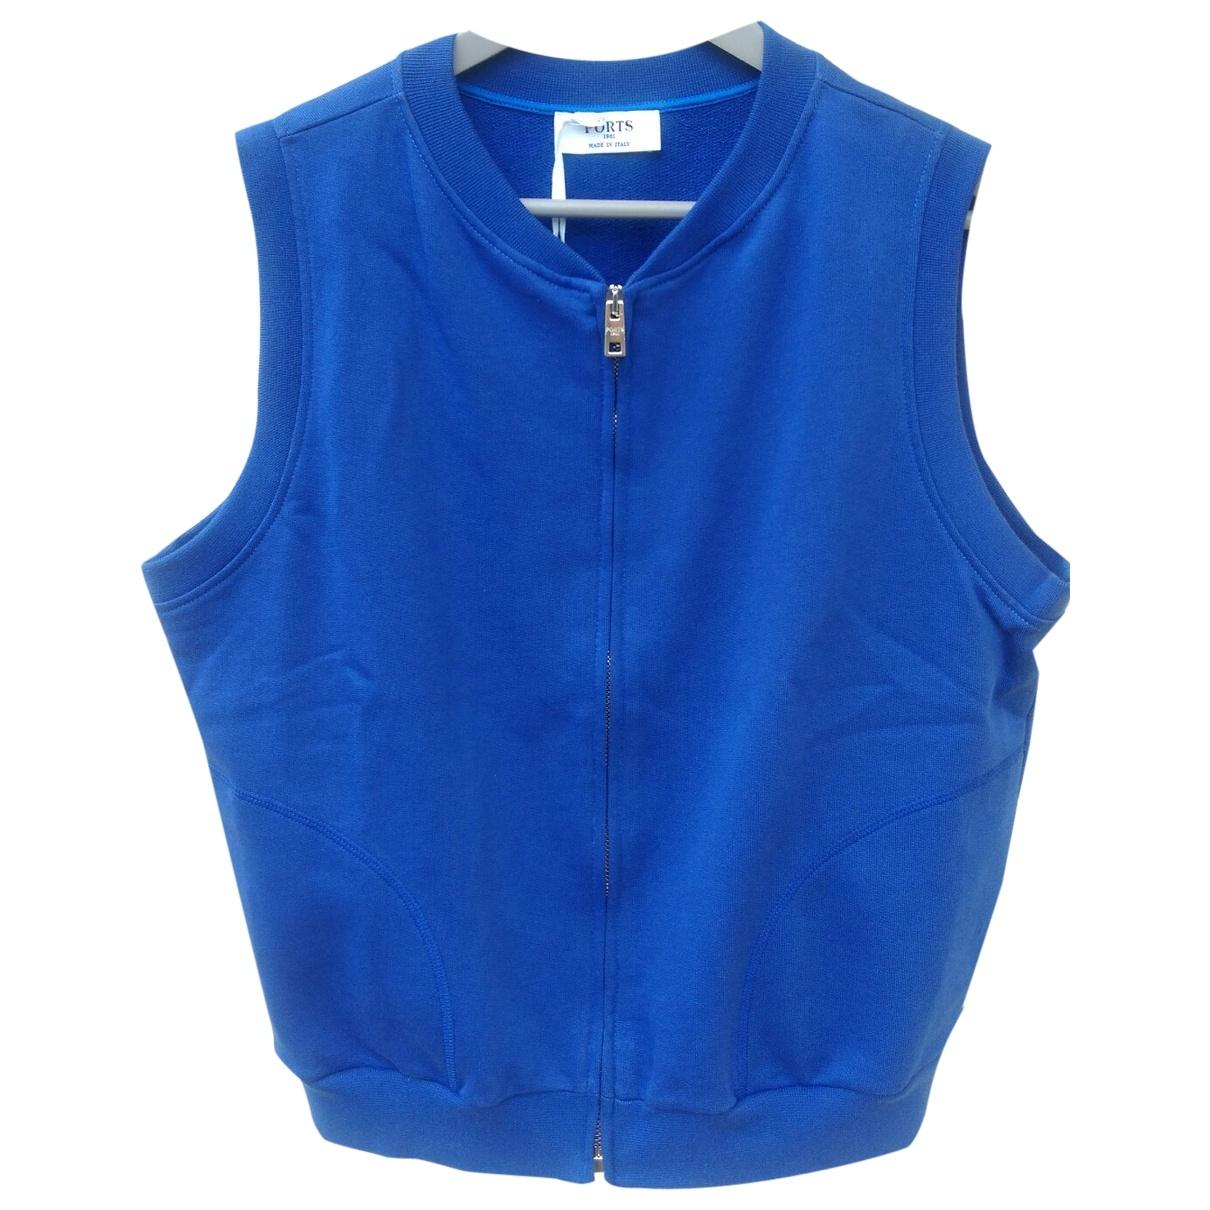 Ports 1961 \N Blue Cotton Knitwear for Women M International